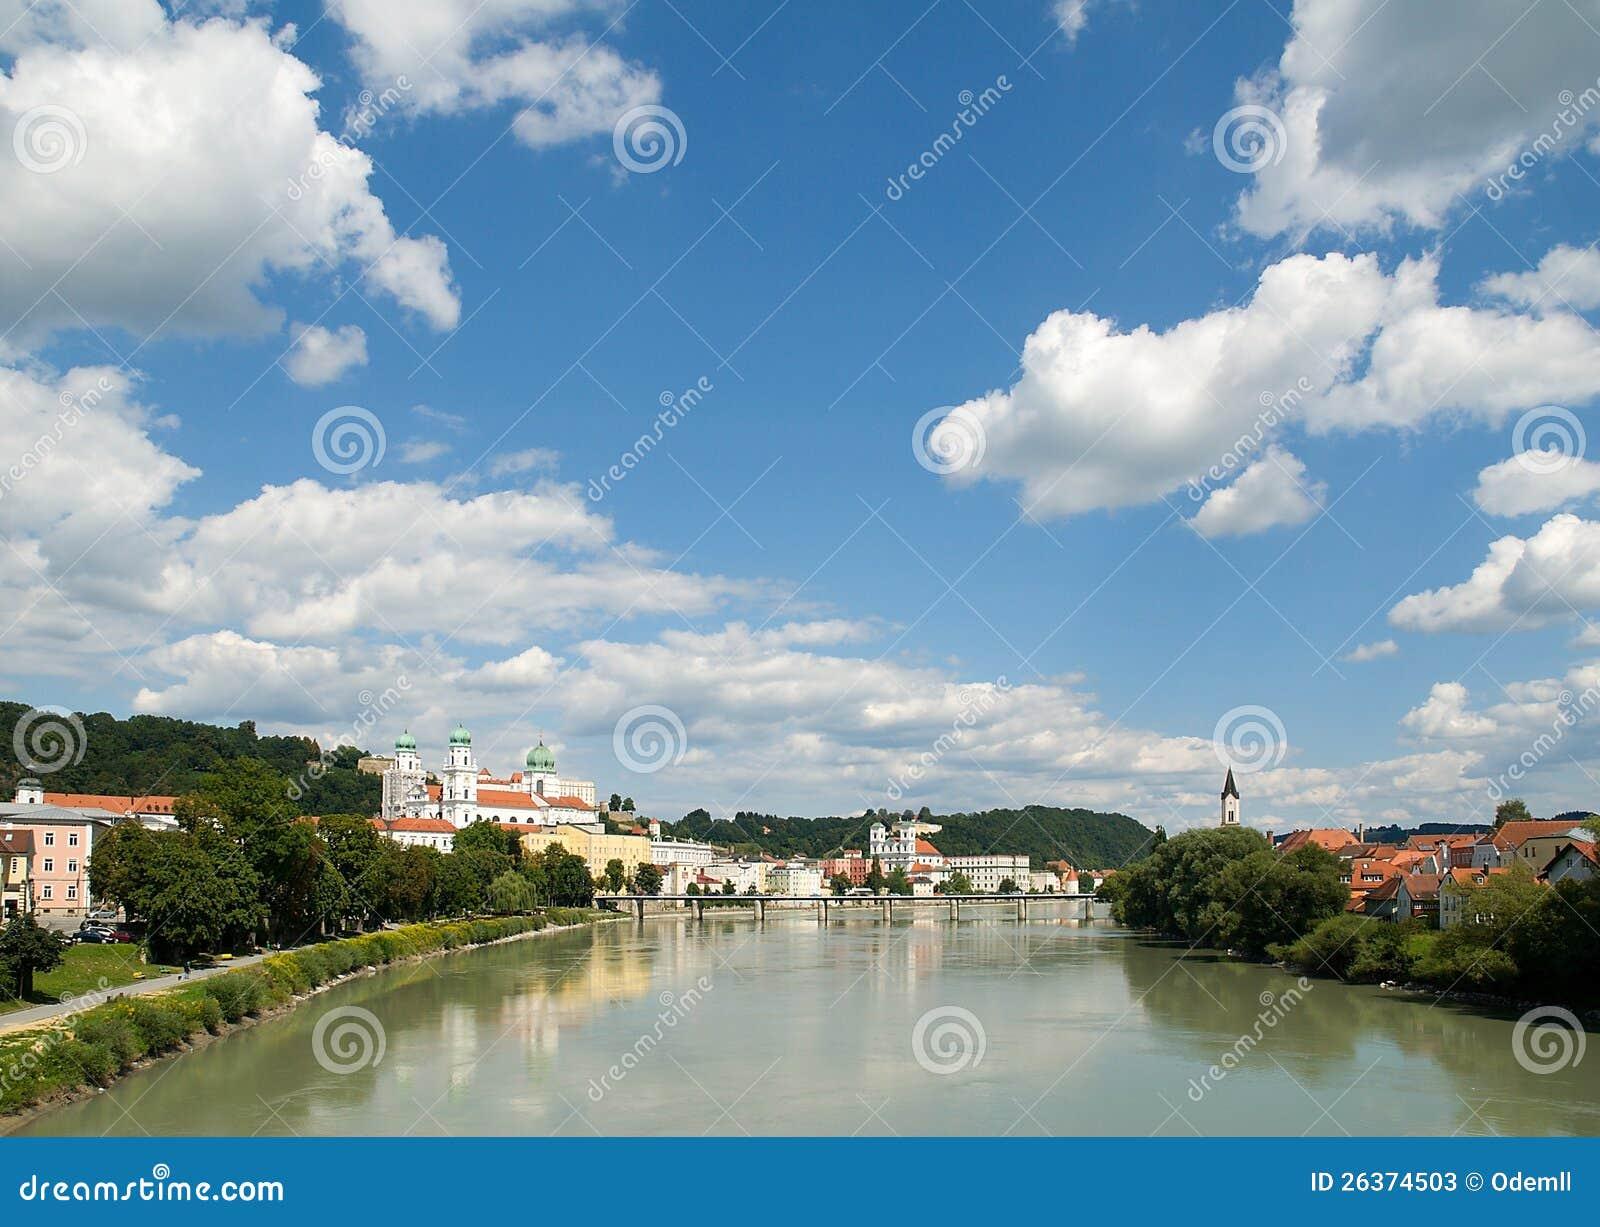 Passau, Inn Promenade